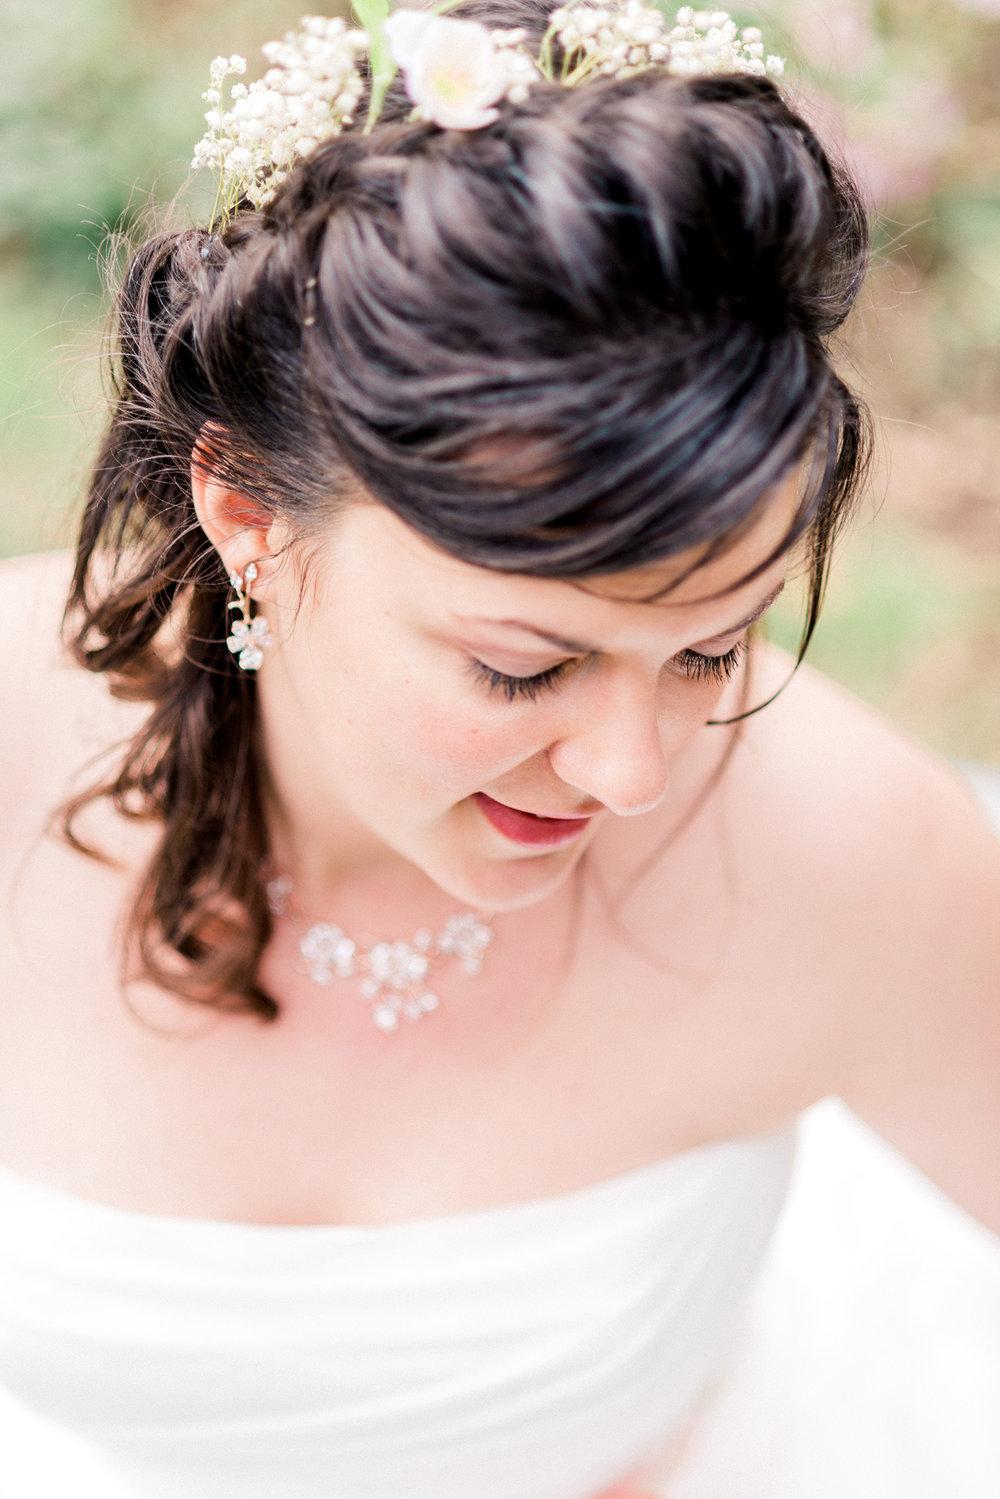 DianaElizabethPhotography_KatelinBridals022.JPG